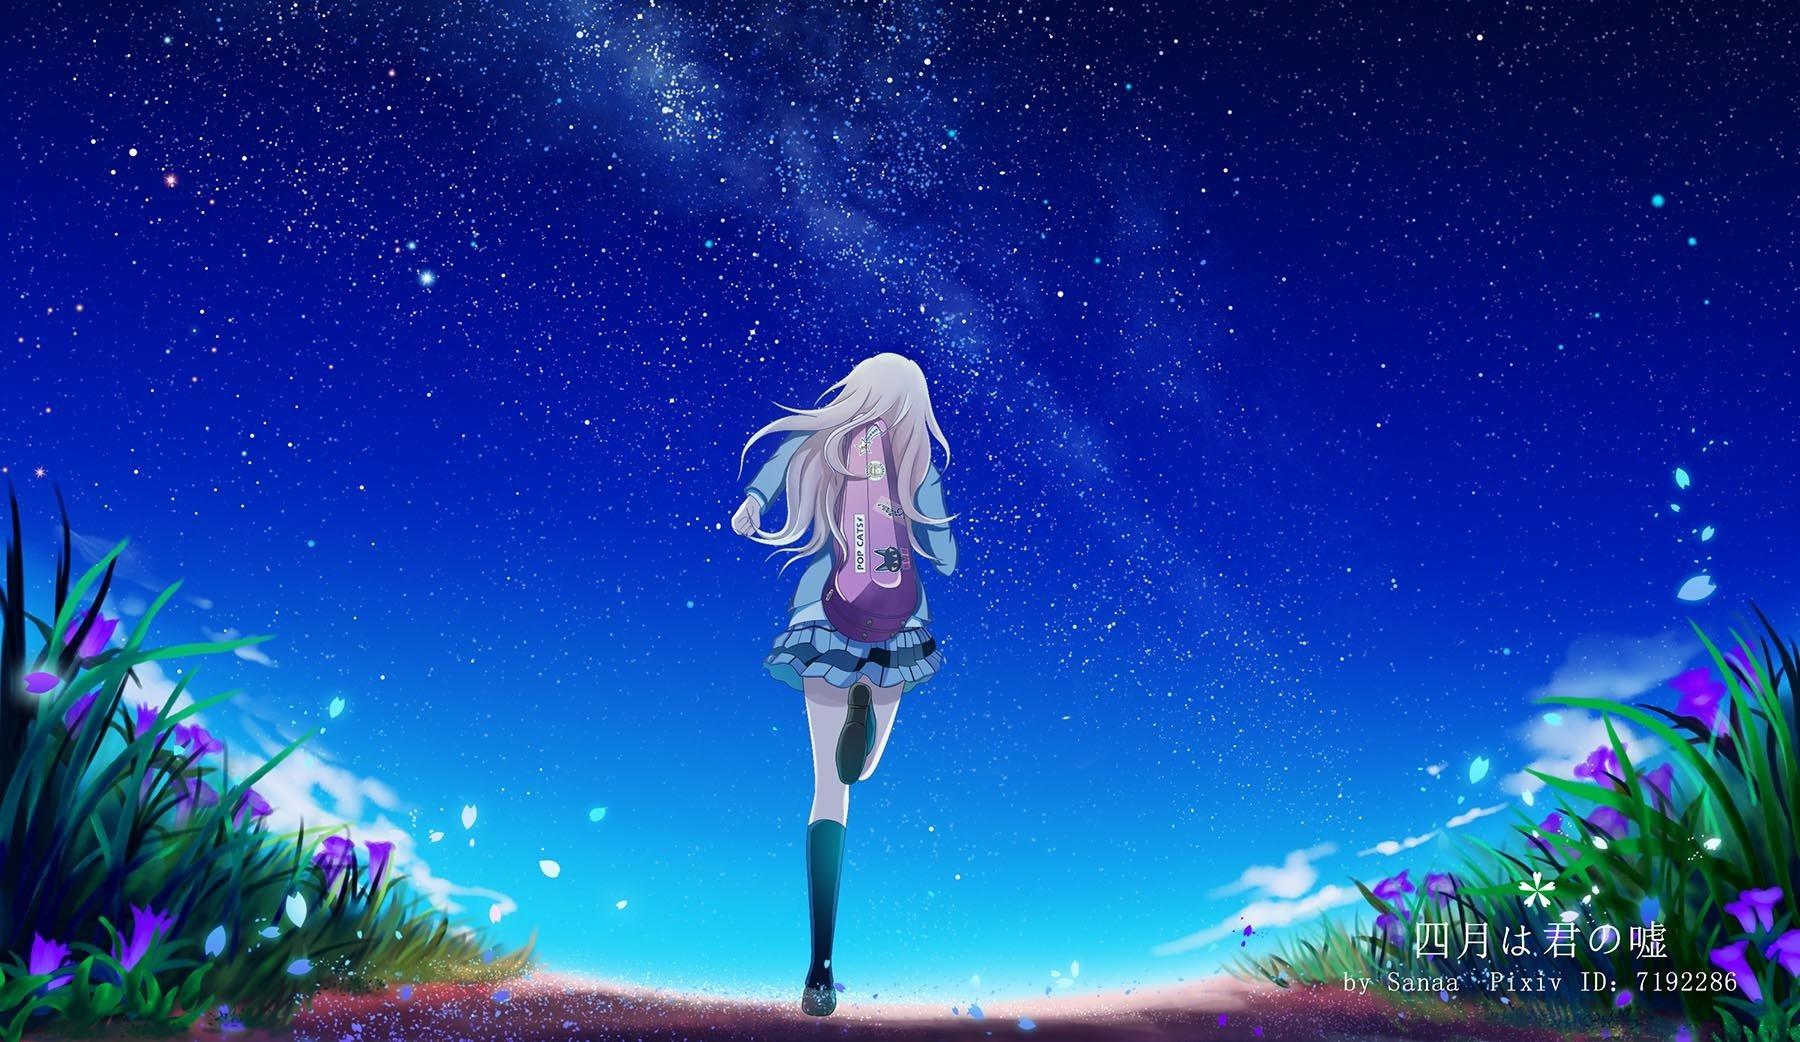 Life Is Like A Piano Quote Wallpaper Kaori Miyazono Wallpaper And Background Image 1800x1042